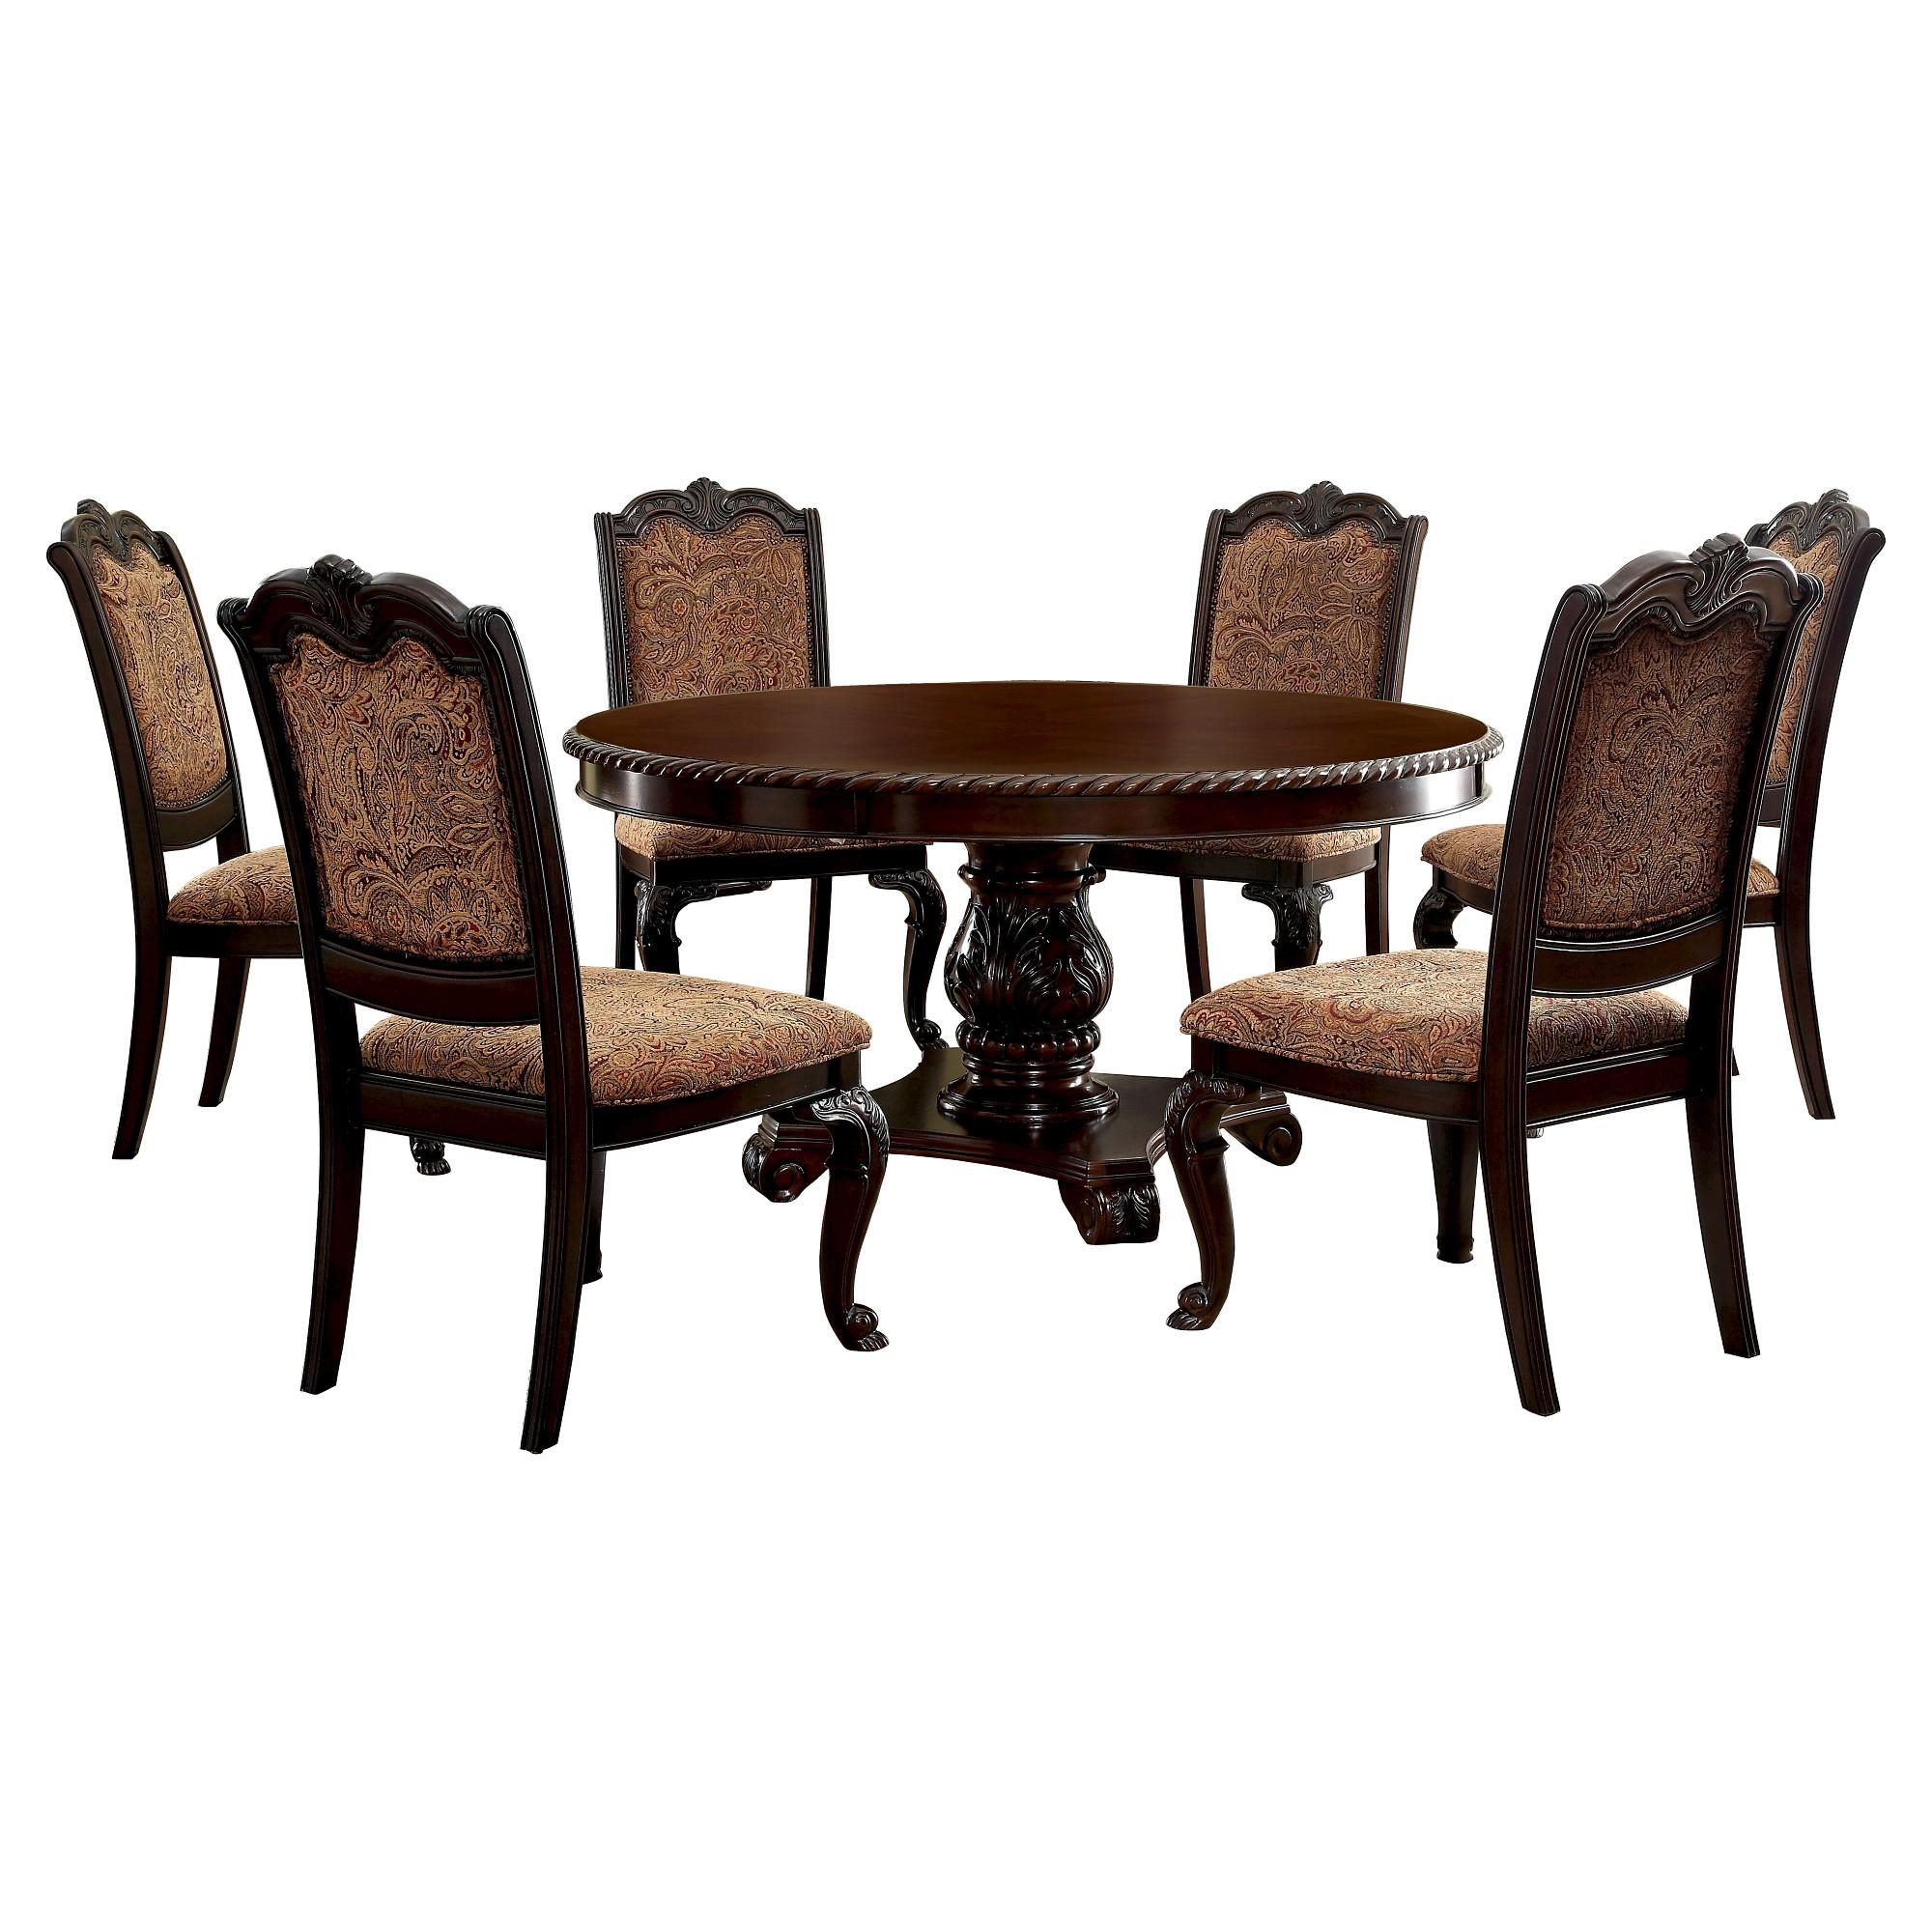 Sun u pine pc elegant fabric round dining set woodbrown cherry